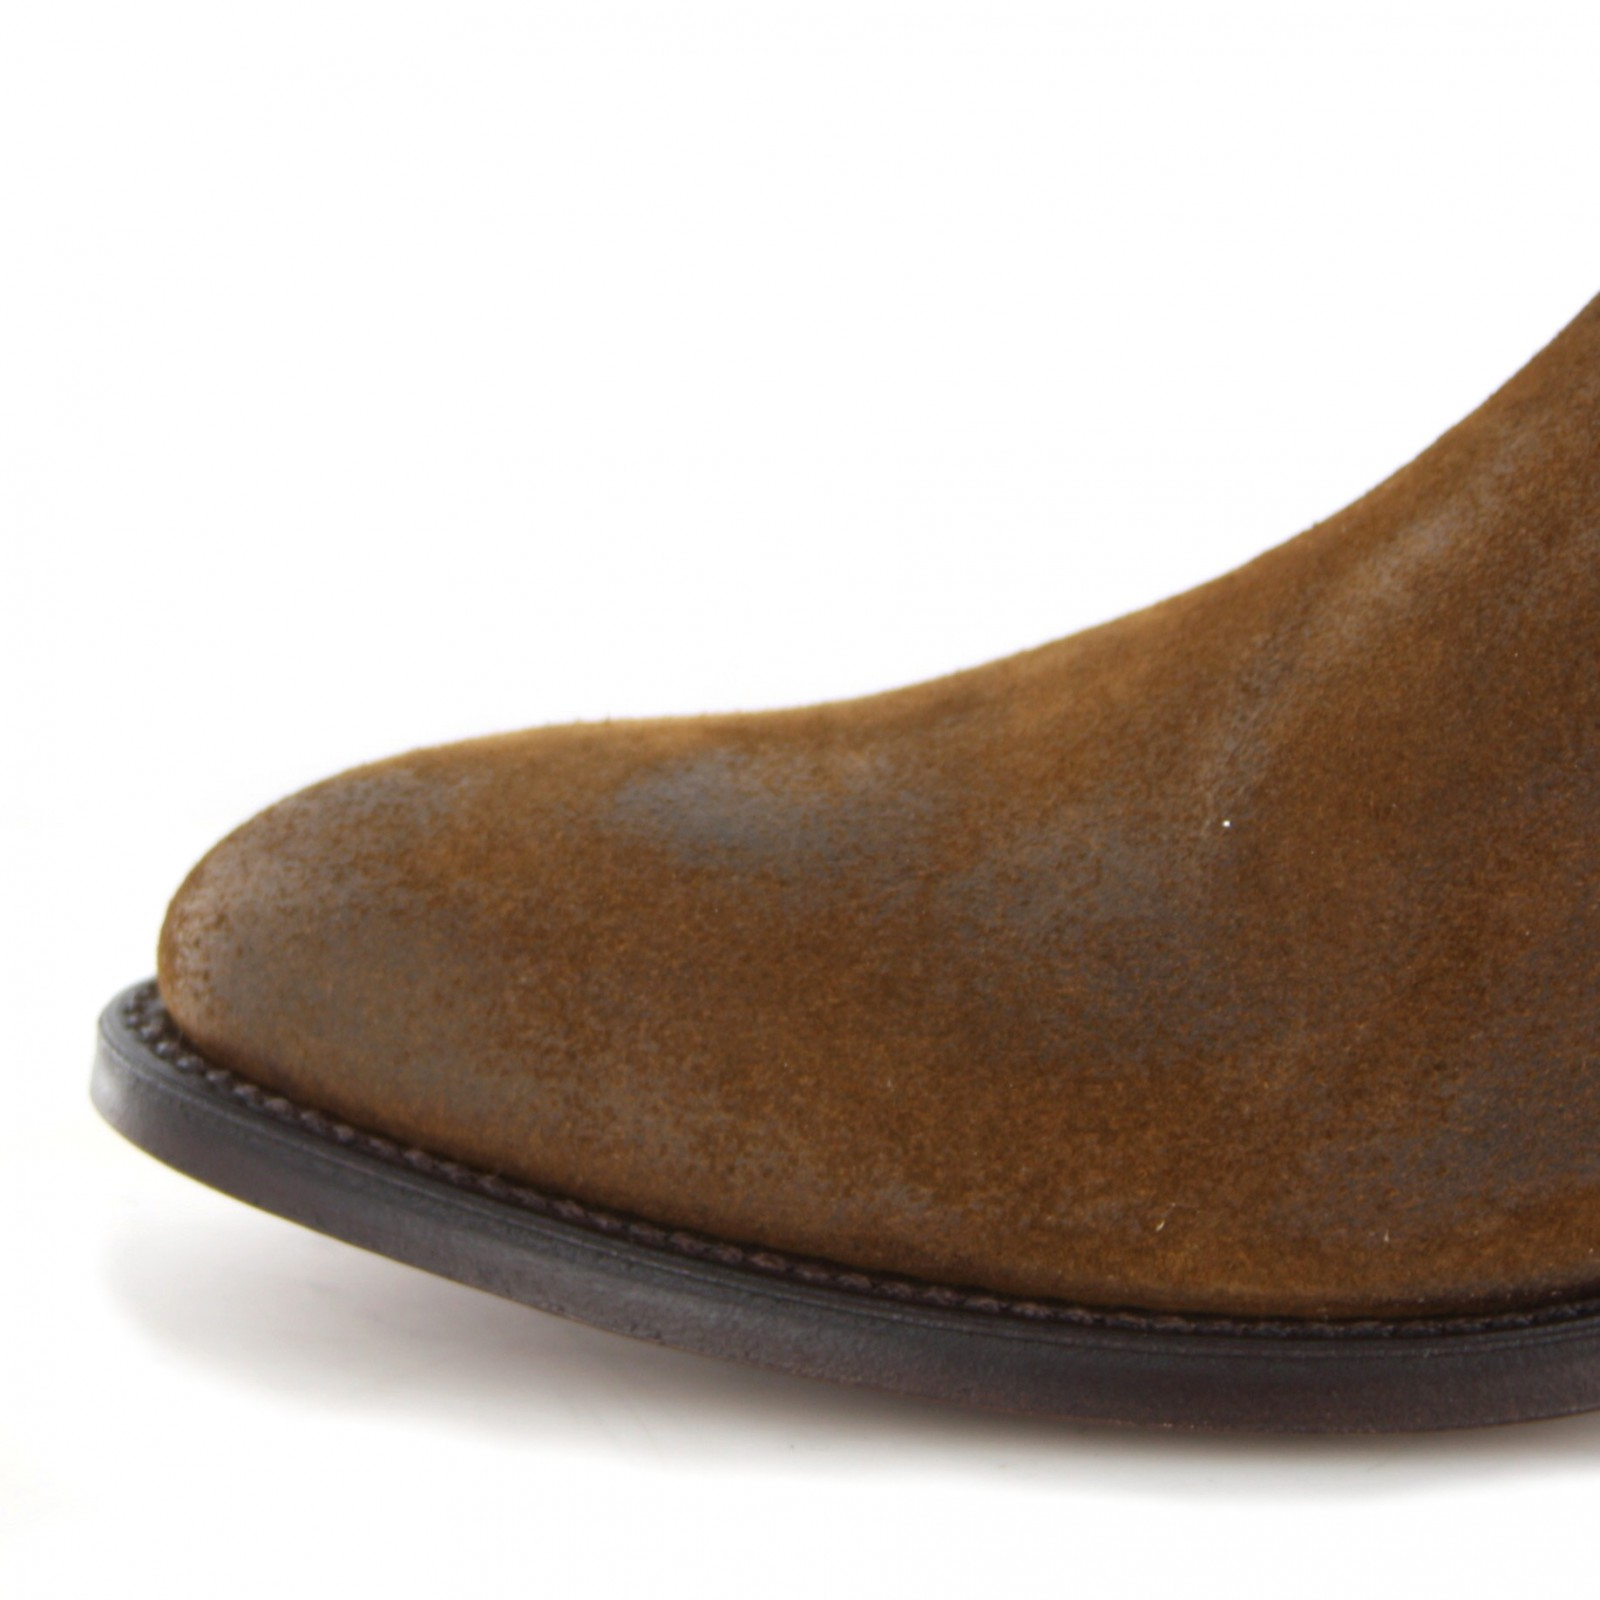 Tony Mora 1257 U Tabaco Westernstiefel - braun | Fashion Boots